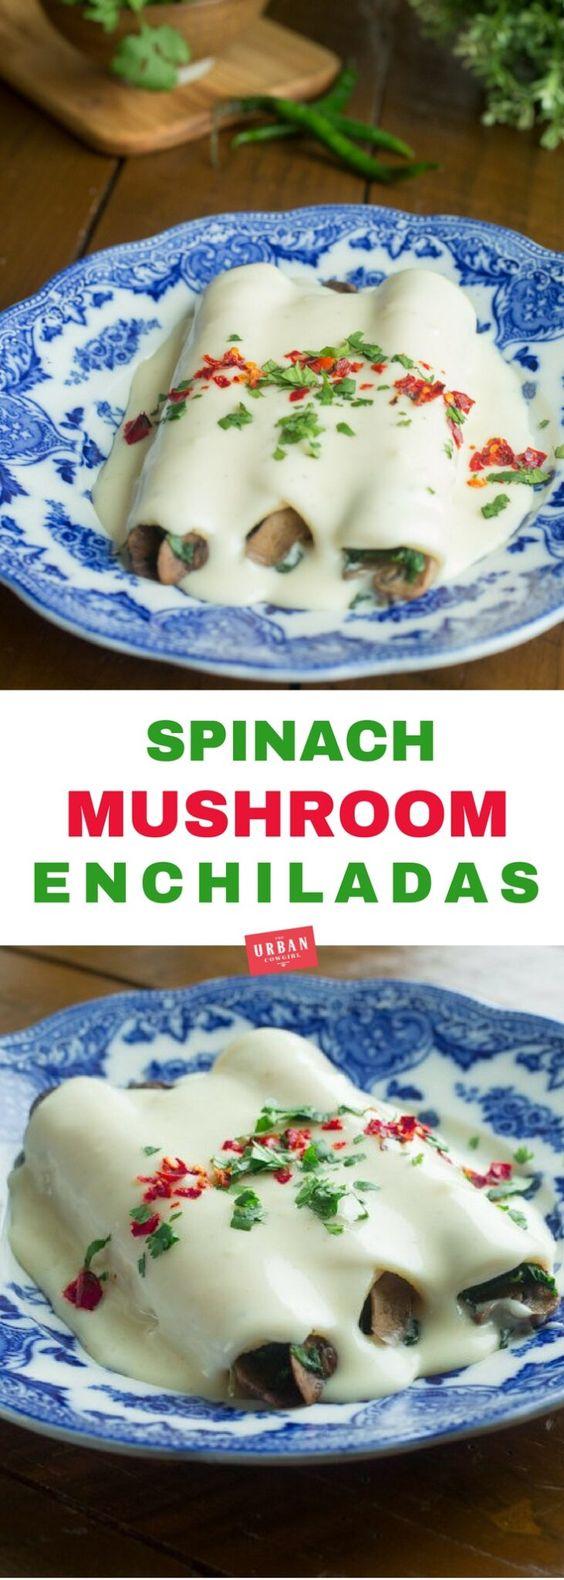 Spinach and Mushroom Enchiladas with Monterey Jack Cream Sauce